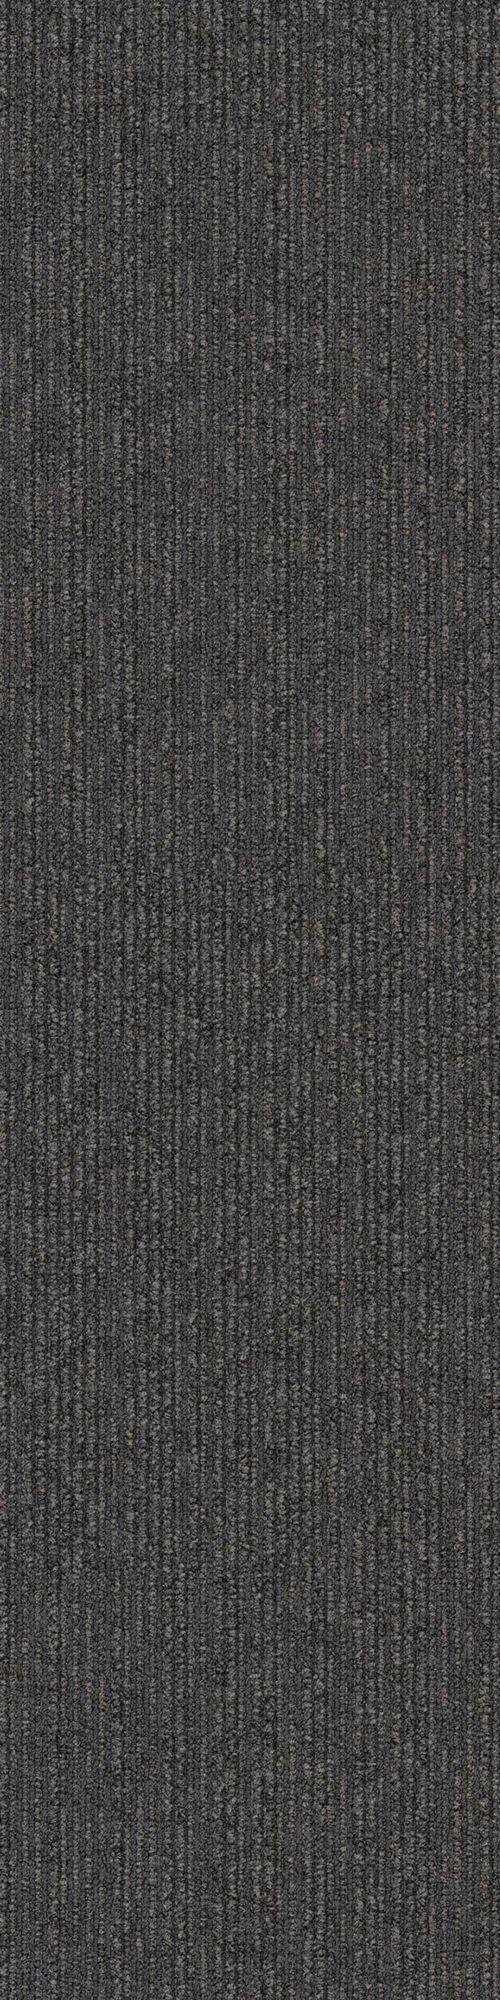 Interface carpet tile: On Line Color name: Pepper Variant 4